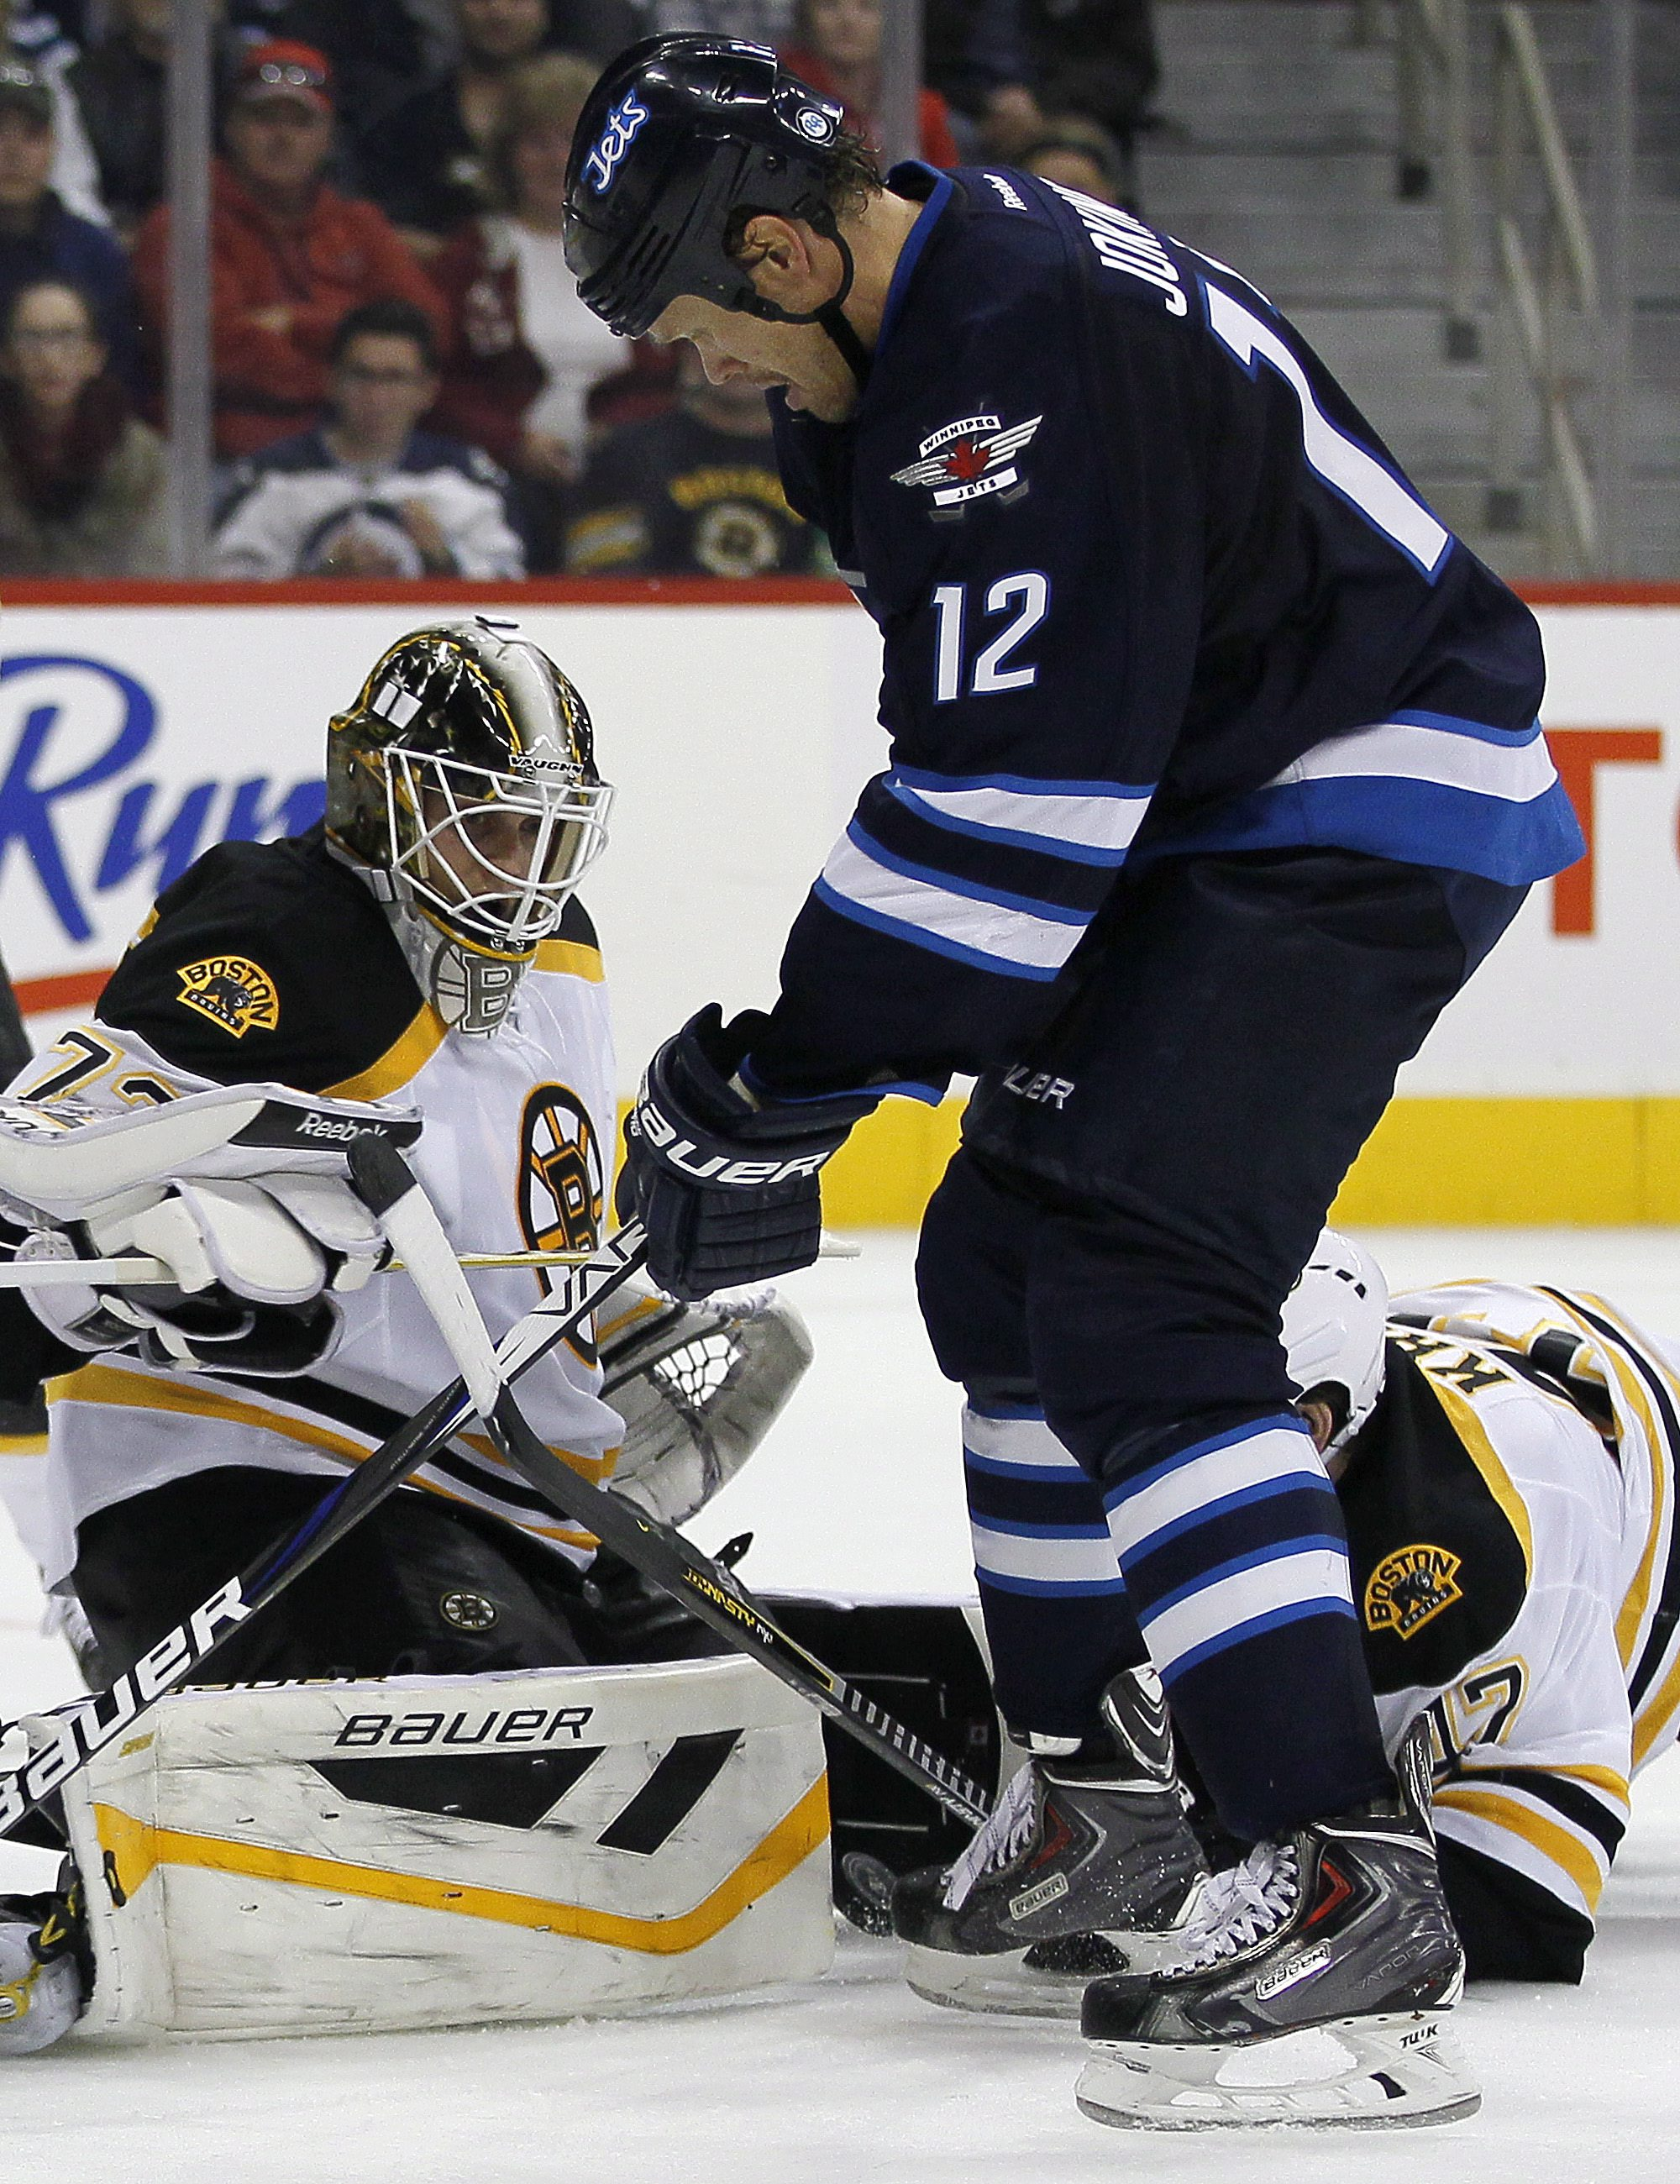 Bruins top Jets 3-2 in OT